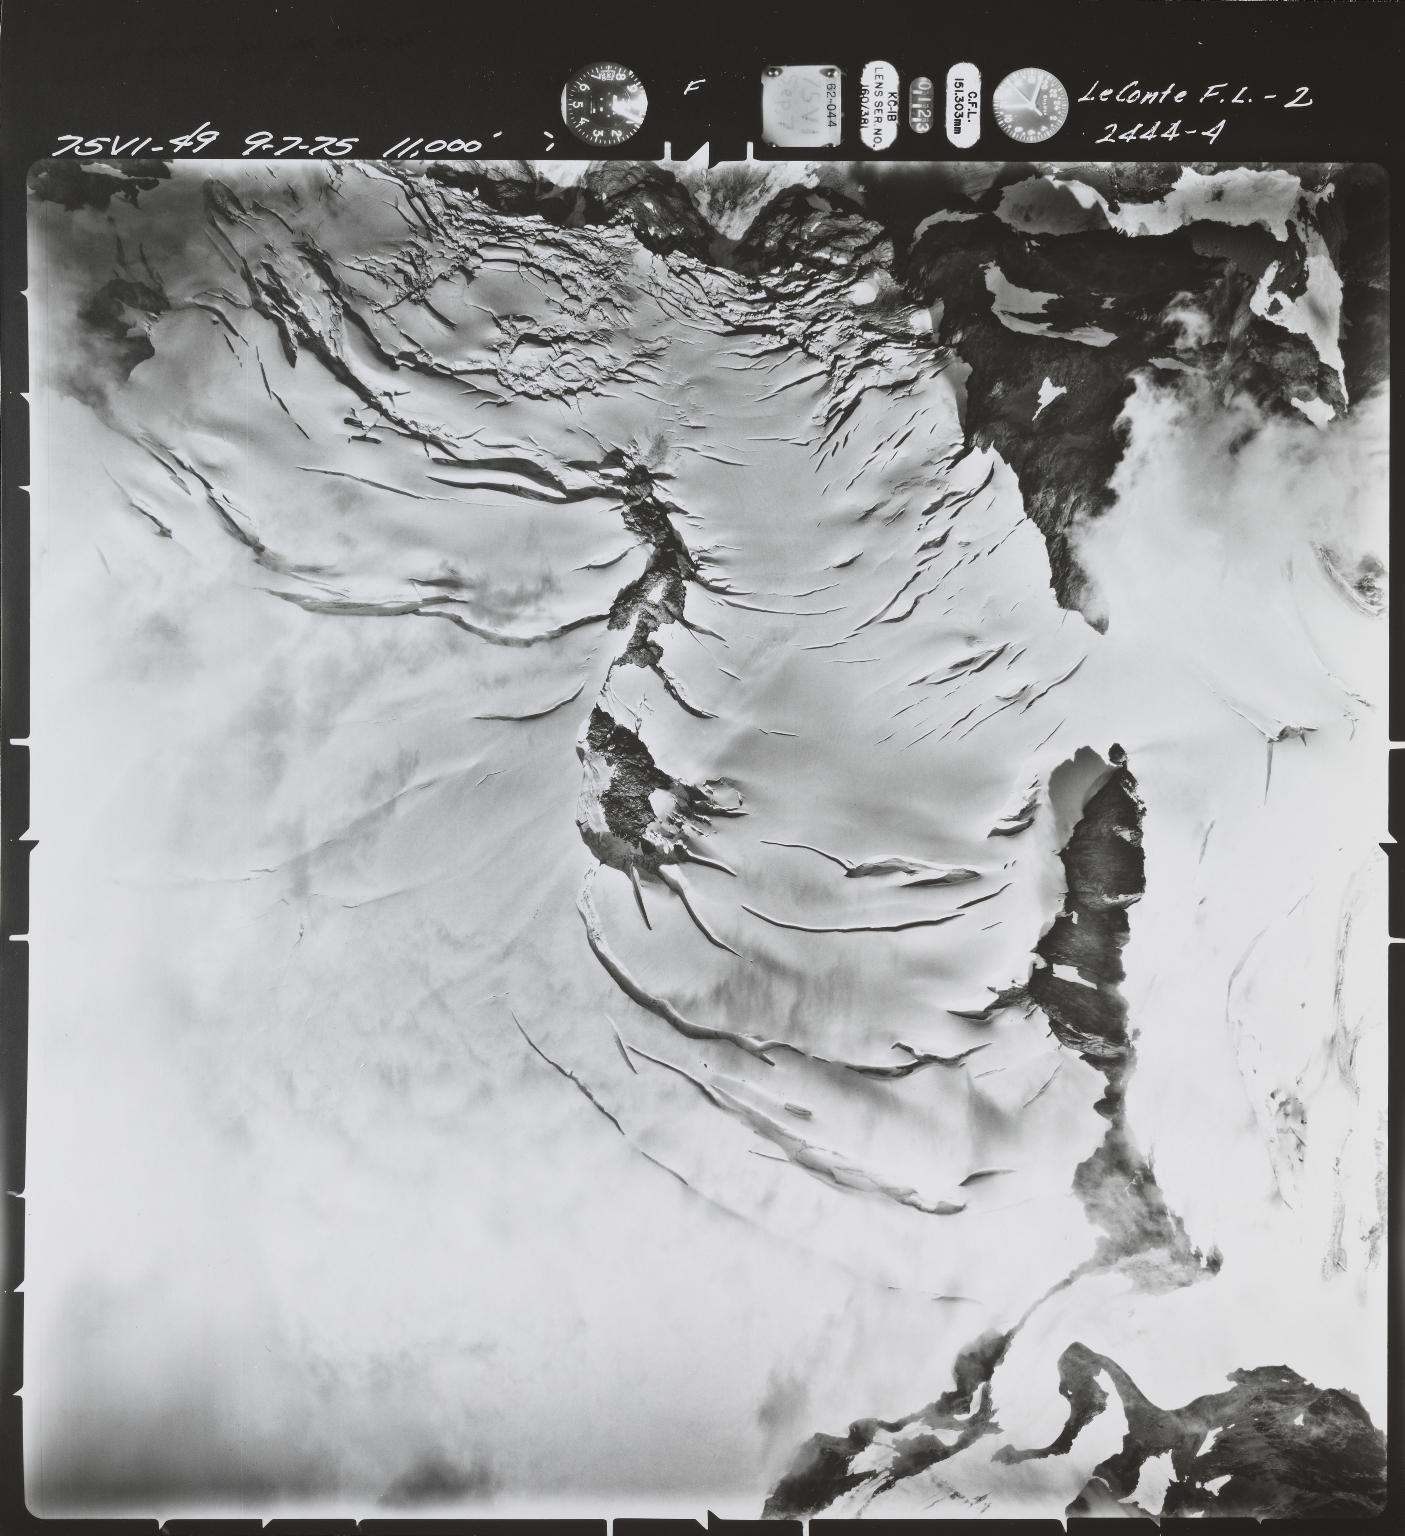 Leconte Glacier, Washington